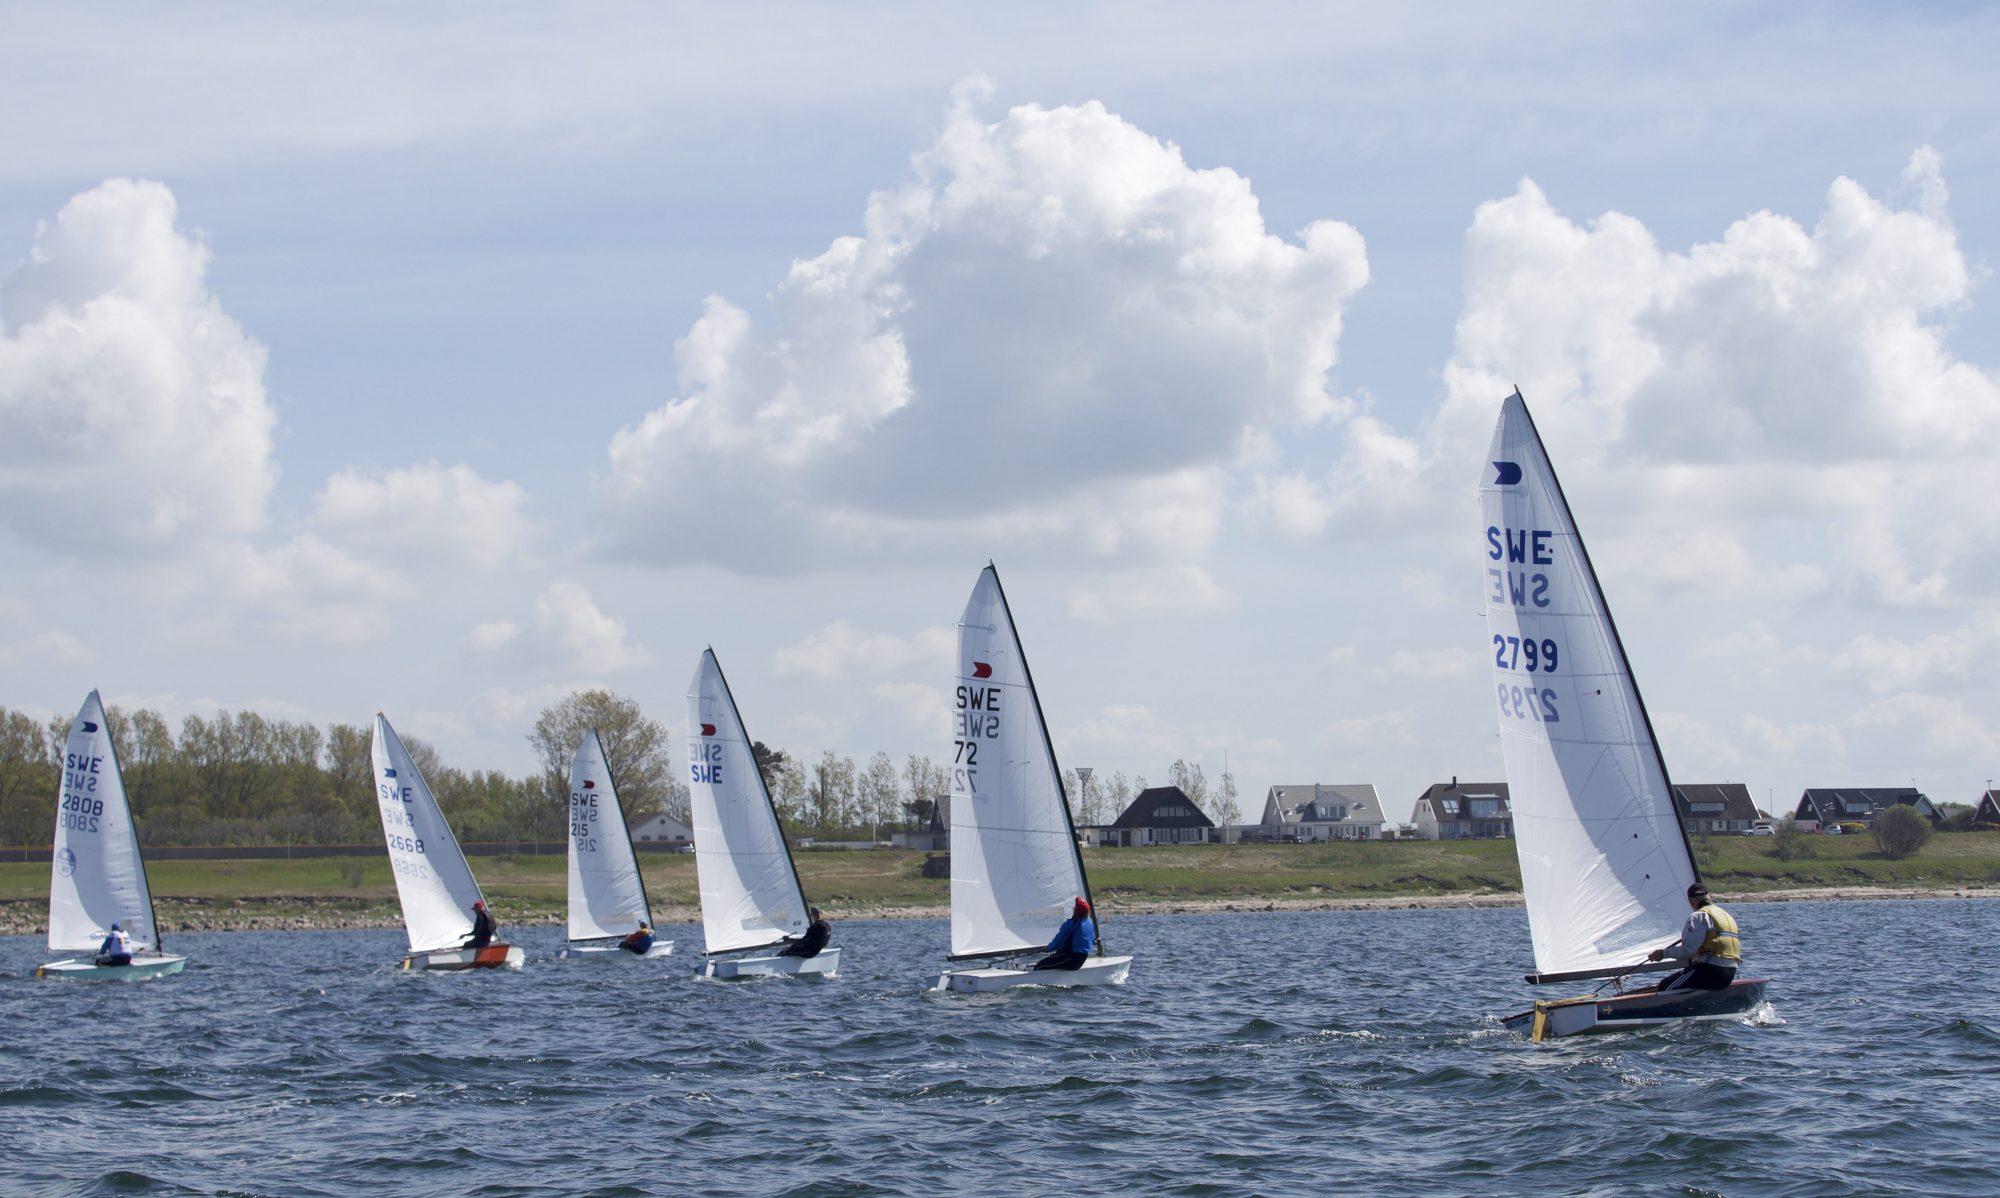 OK sailing in Viken